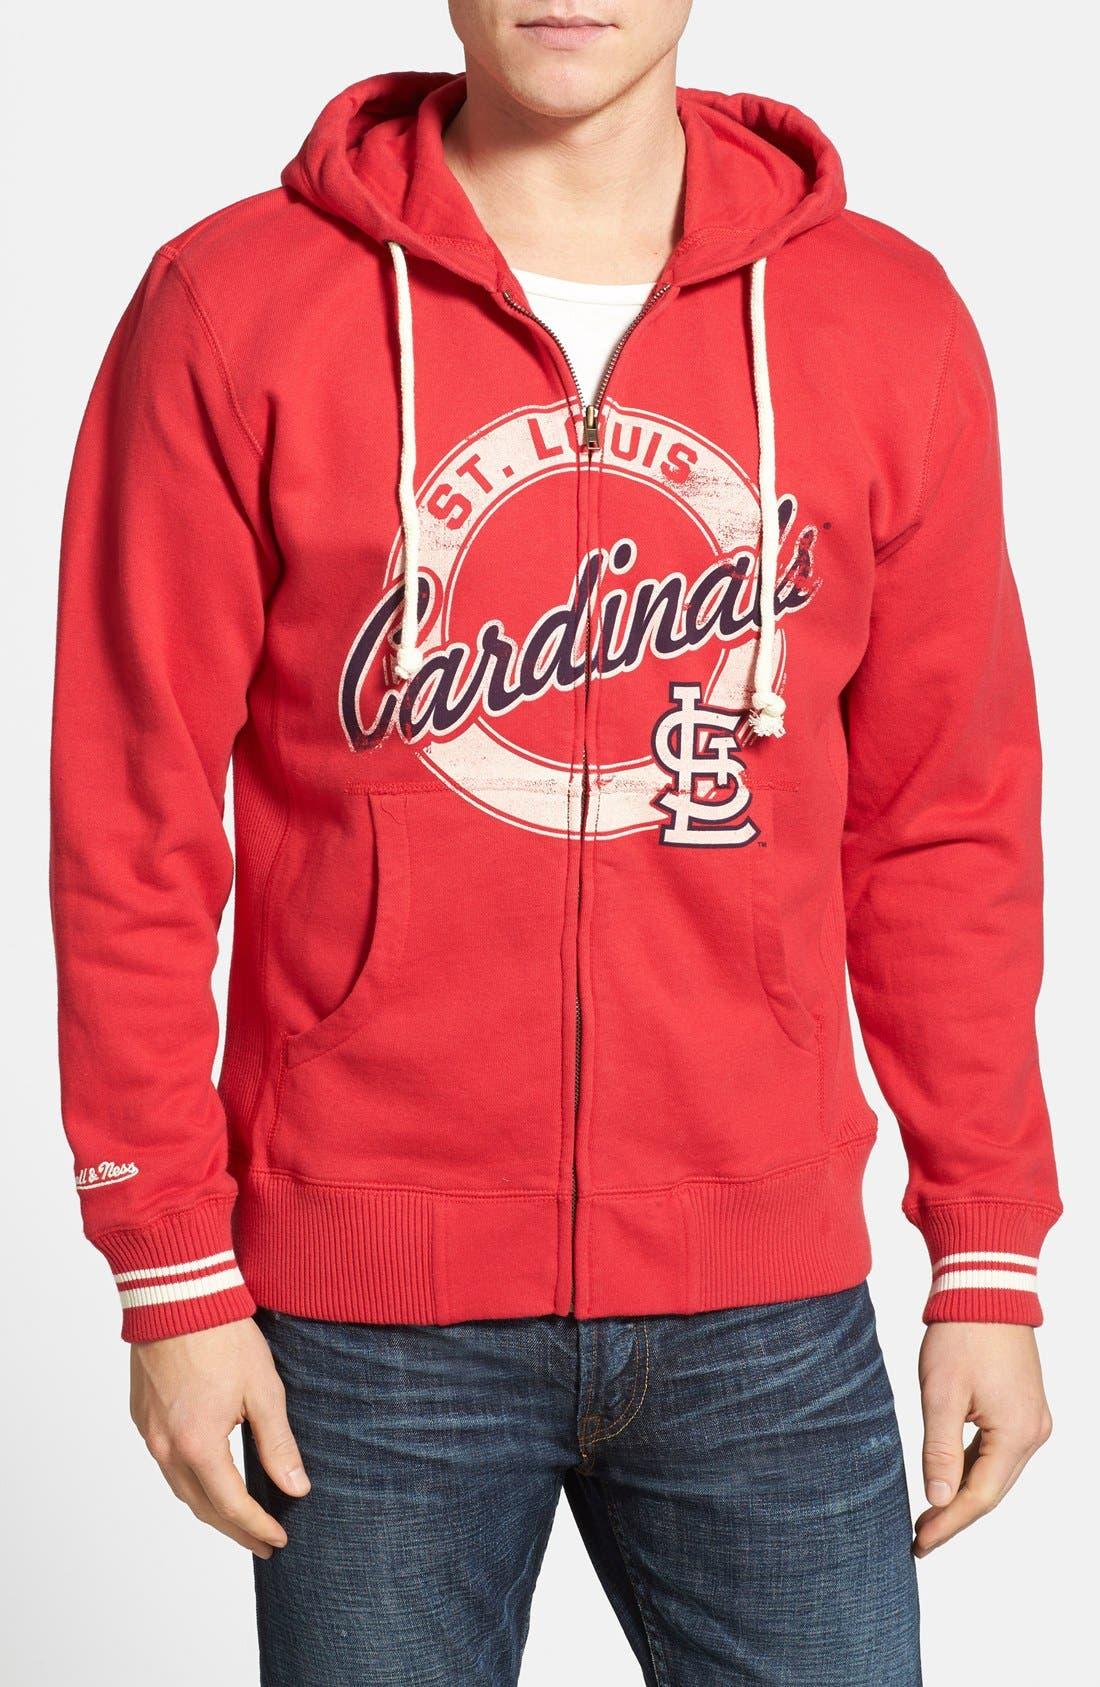 Main Image - Mitchell & Ness 'St. Louis Cardinals' Full Zip Hoodie